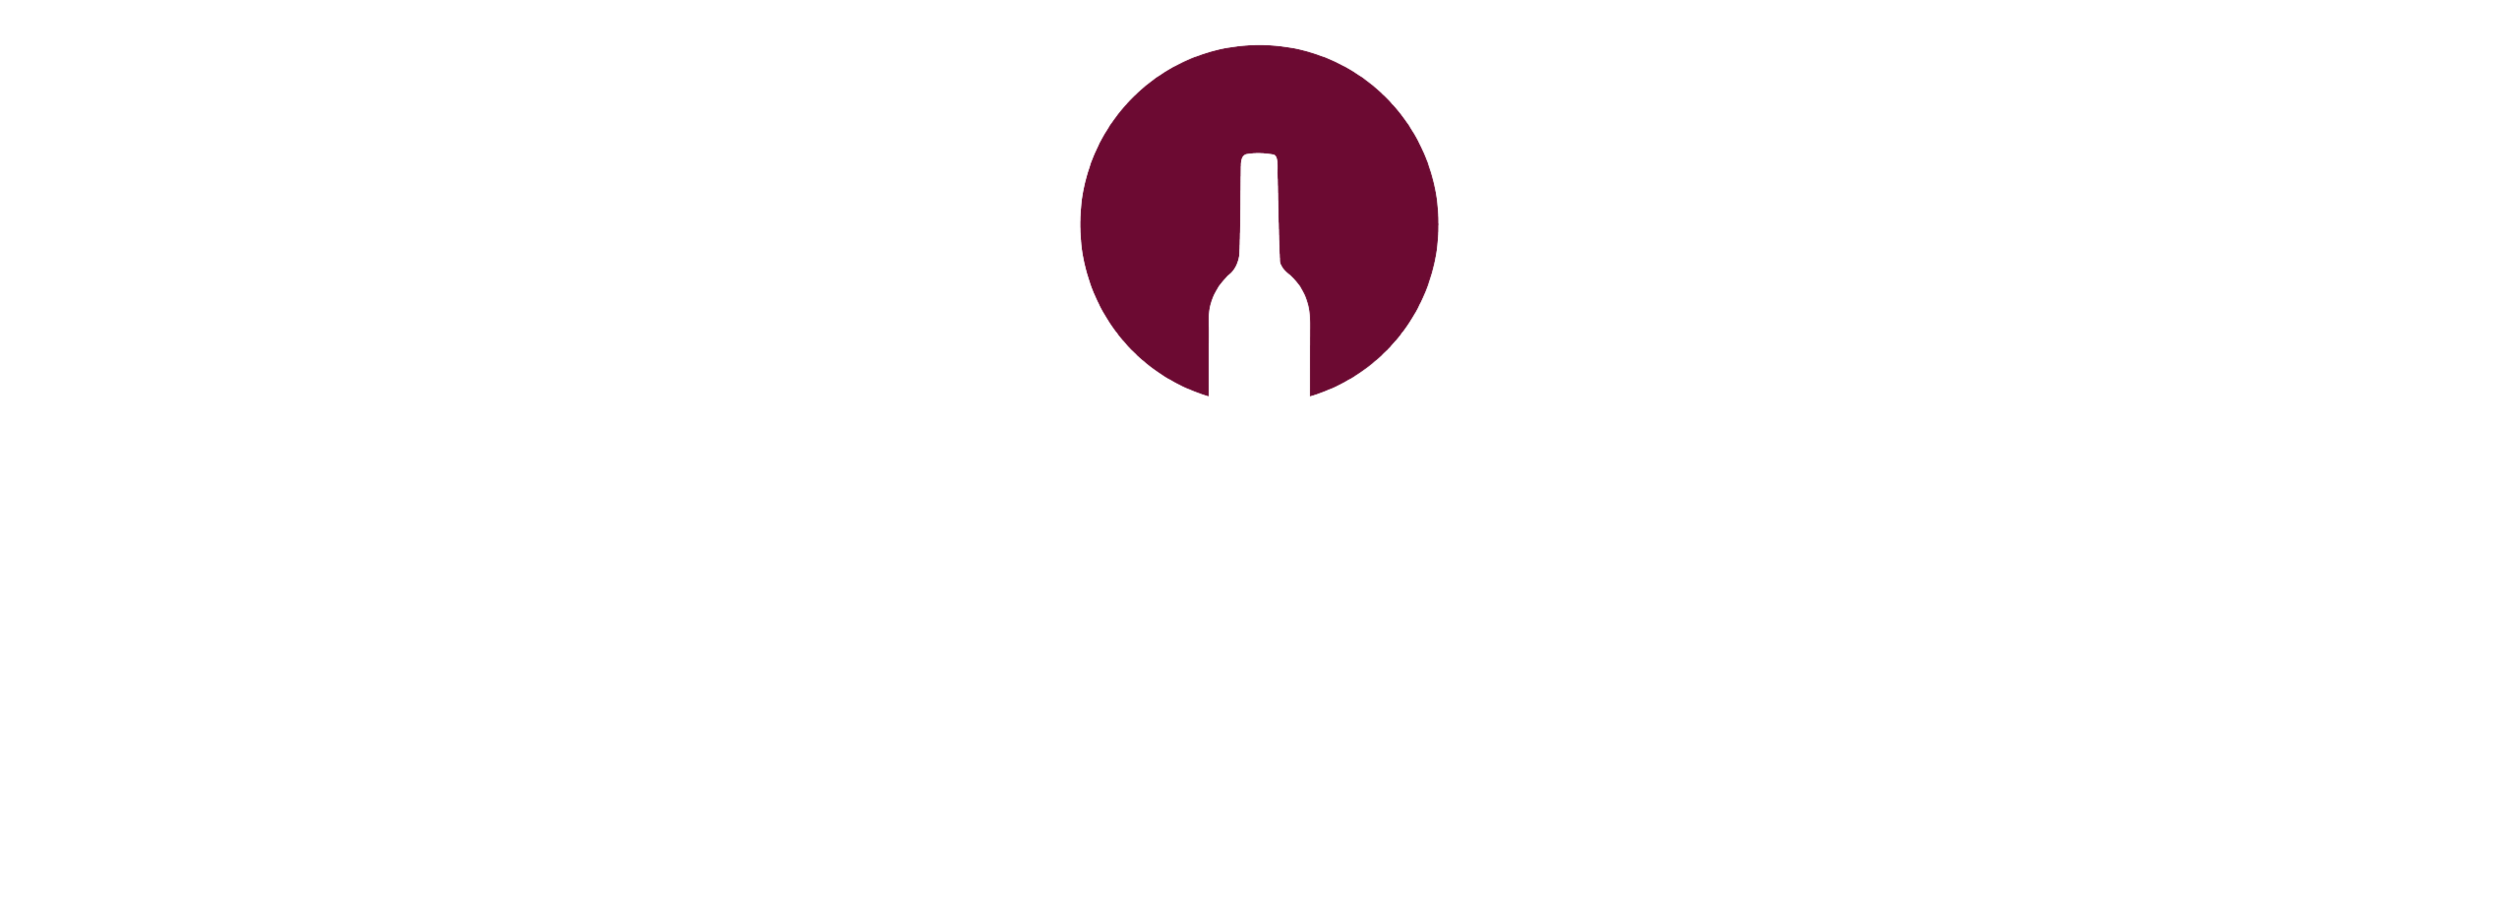 LOGOTYPE-VINAM sans fond-04-01.png